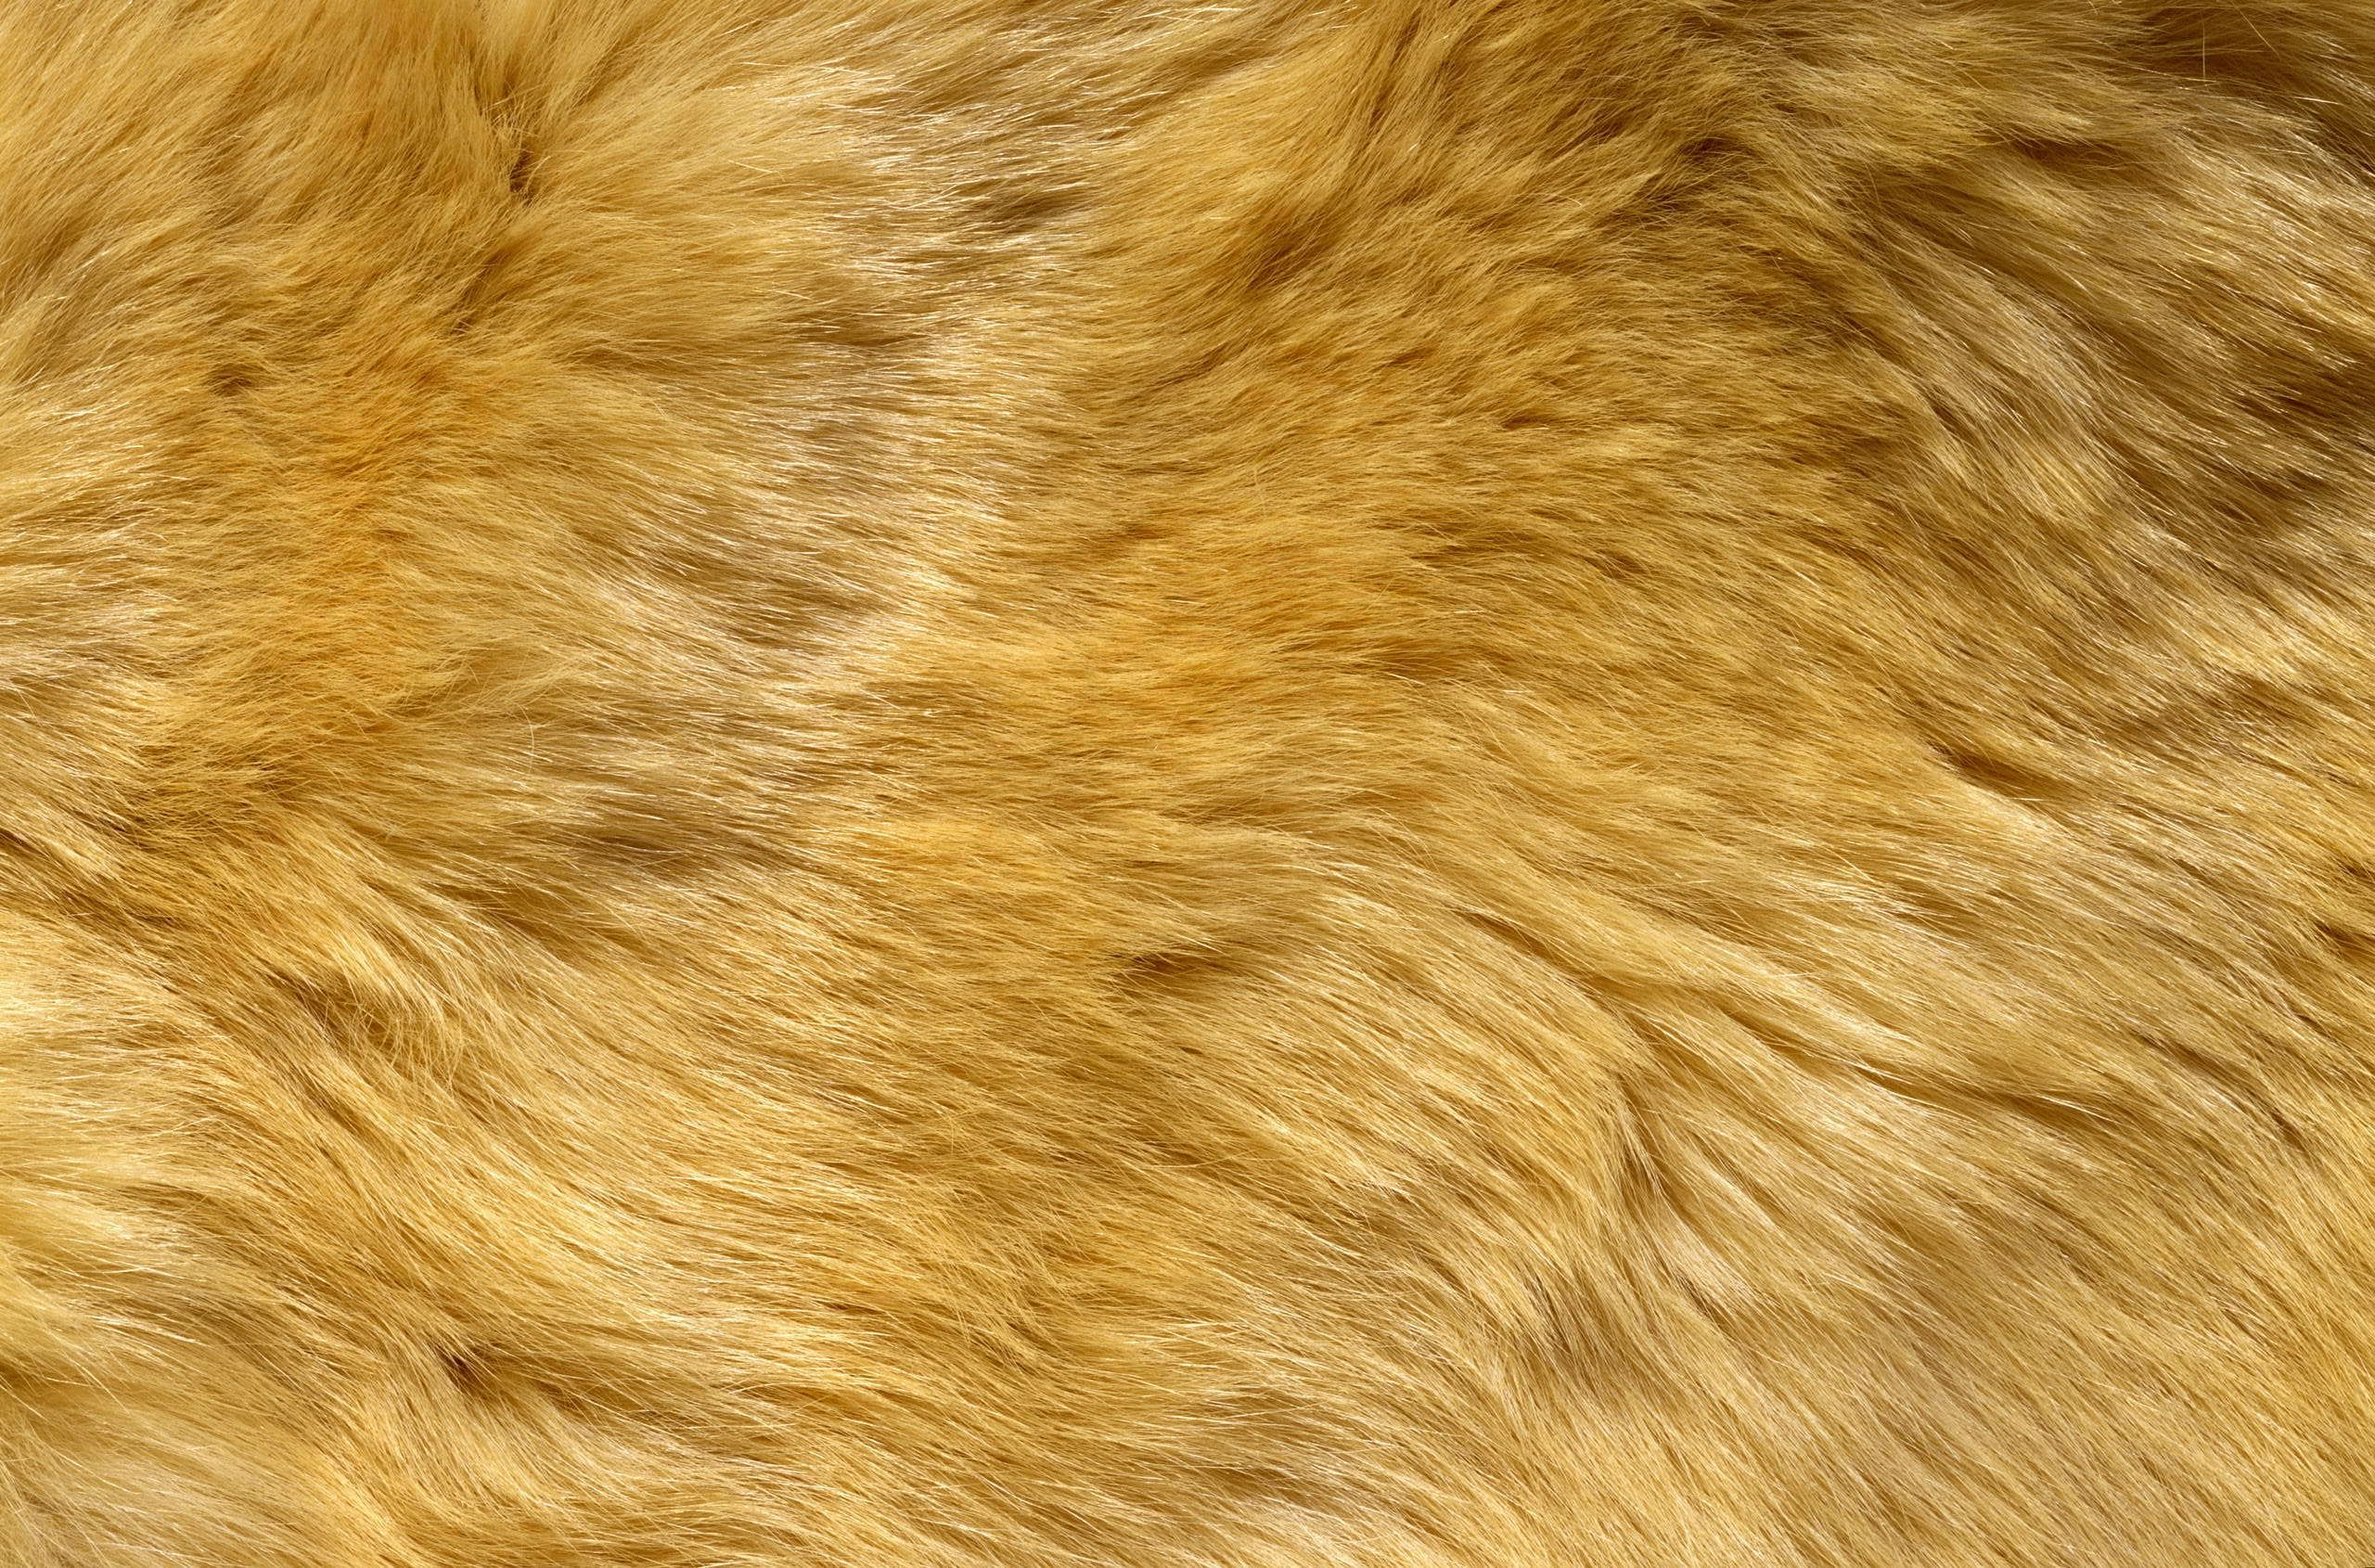 texture fur animal background - photo #2